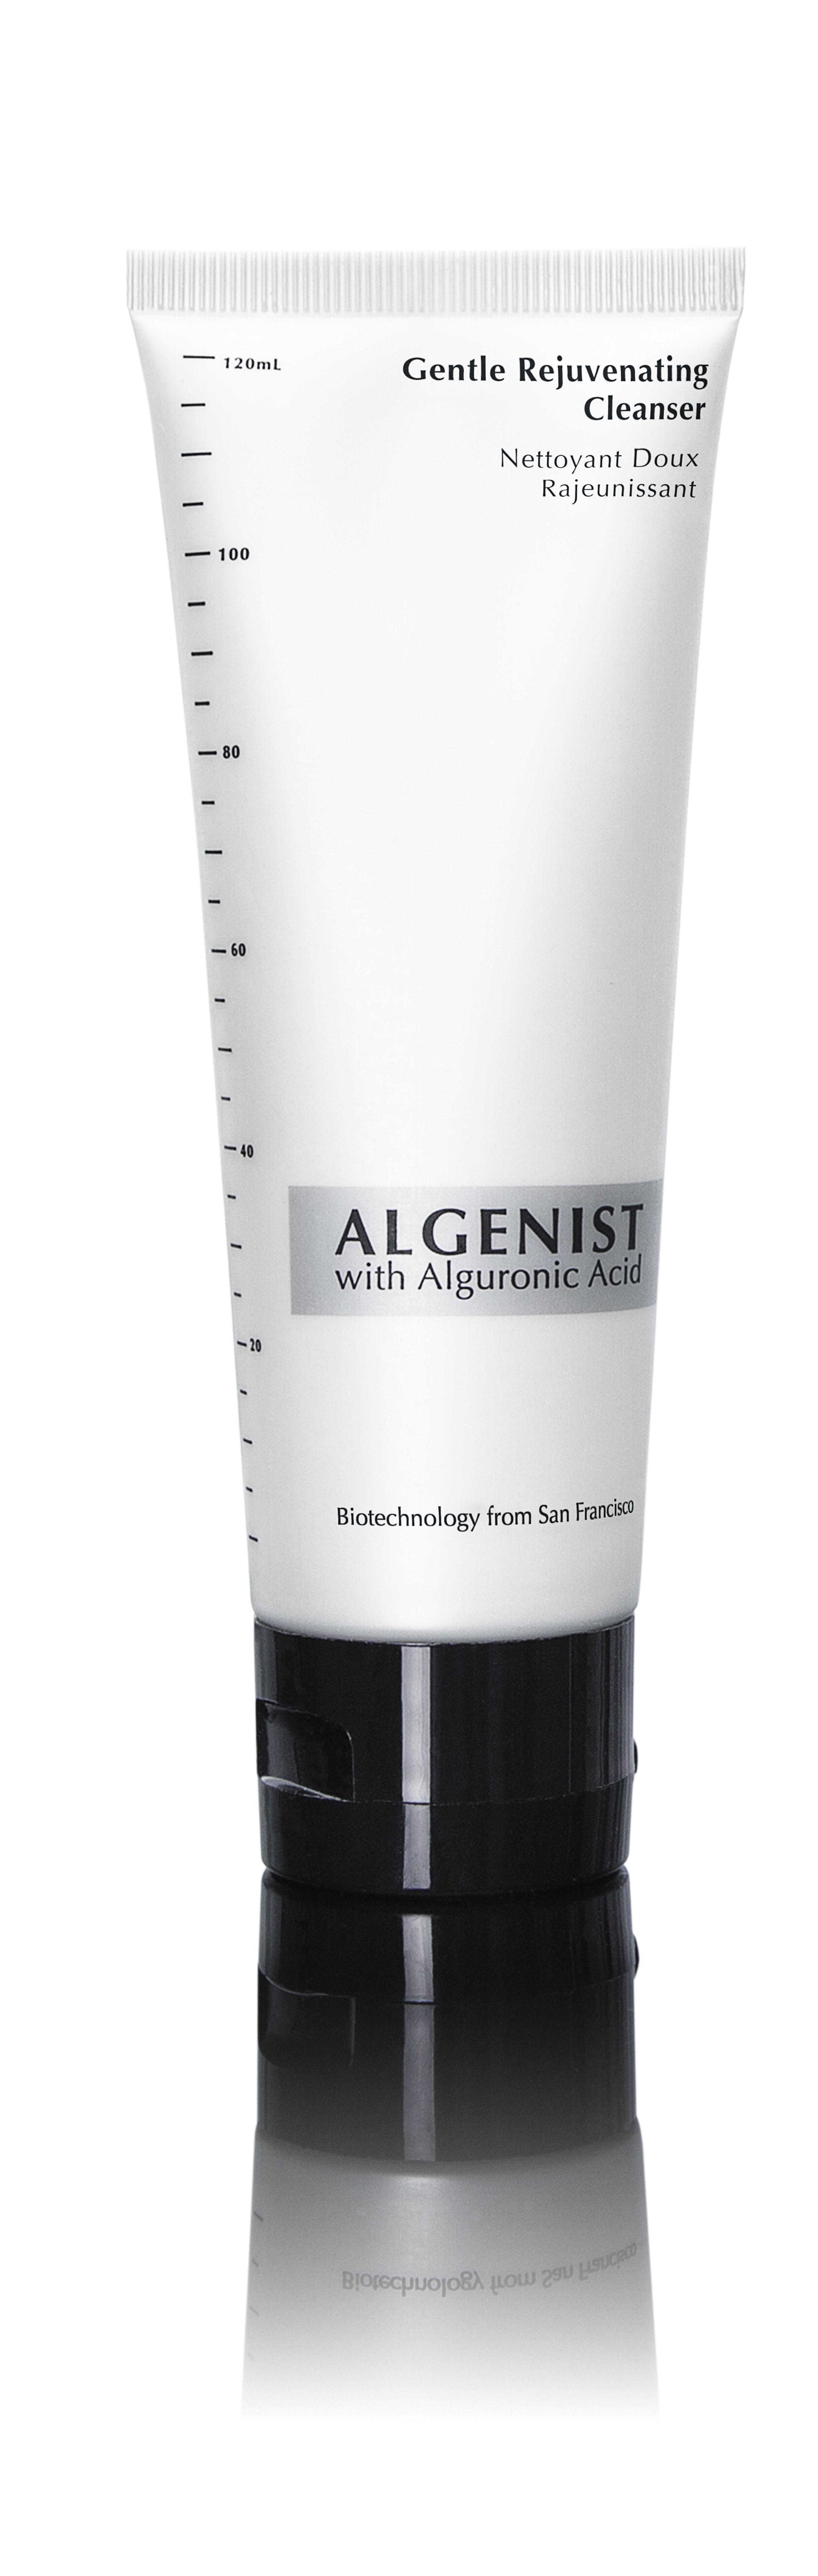 Algenist Gentle Rejuvenating Cleanser, 120 ml